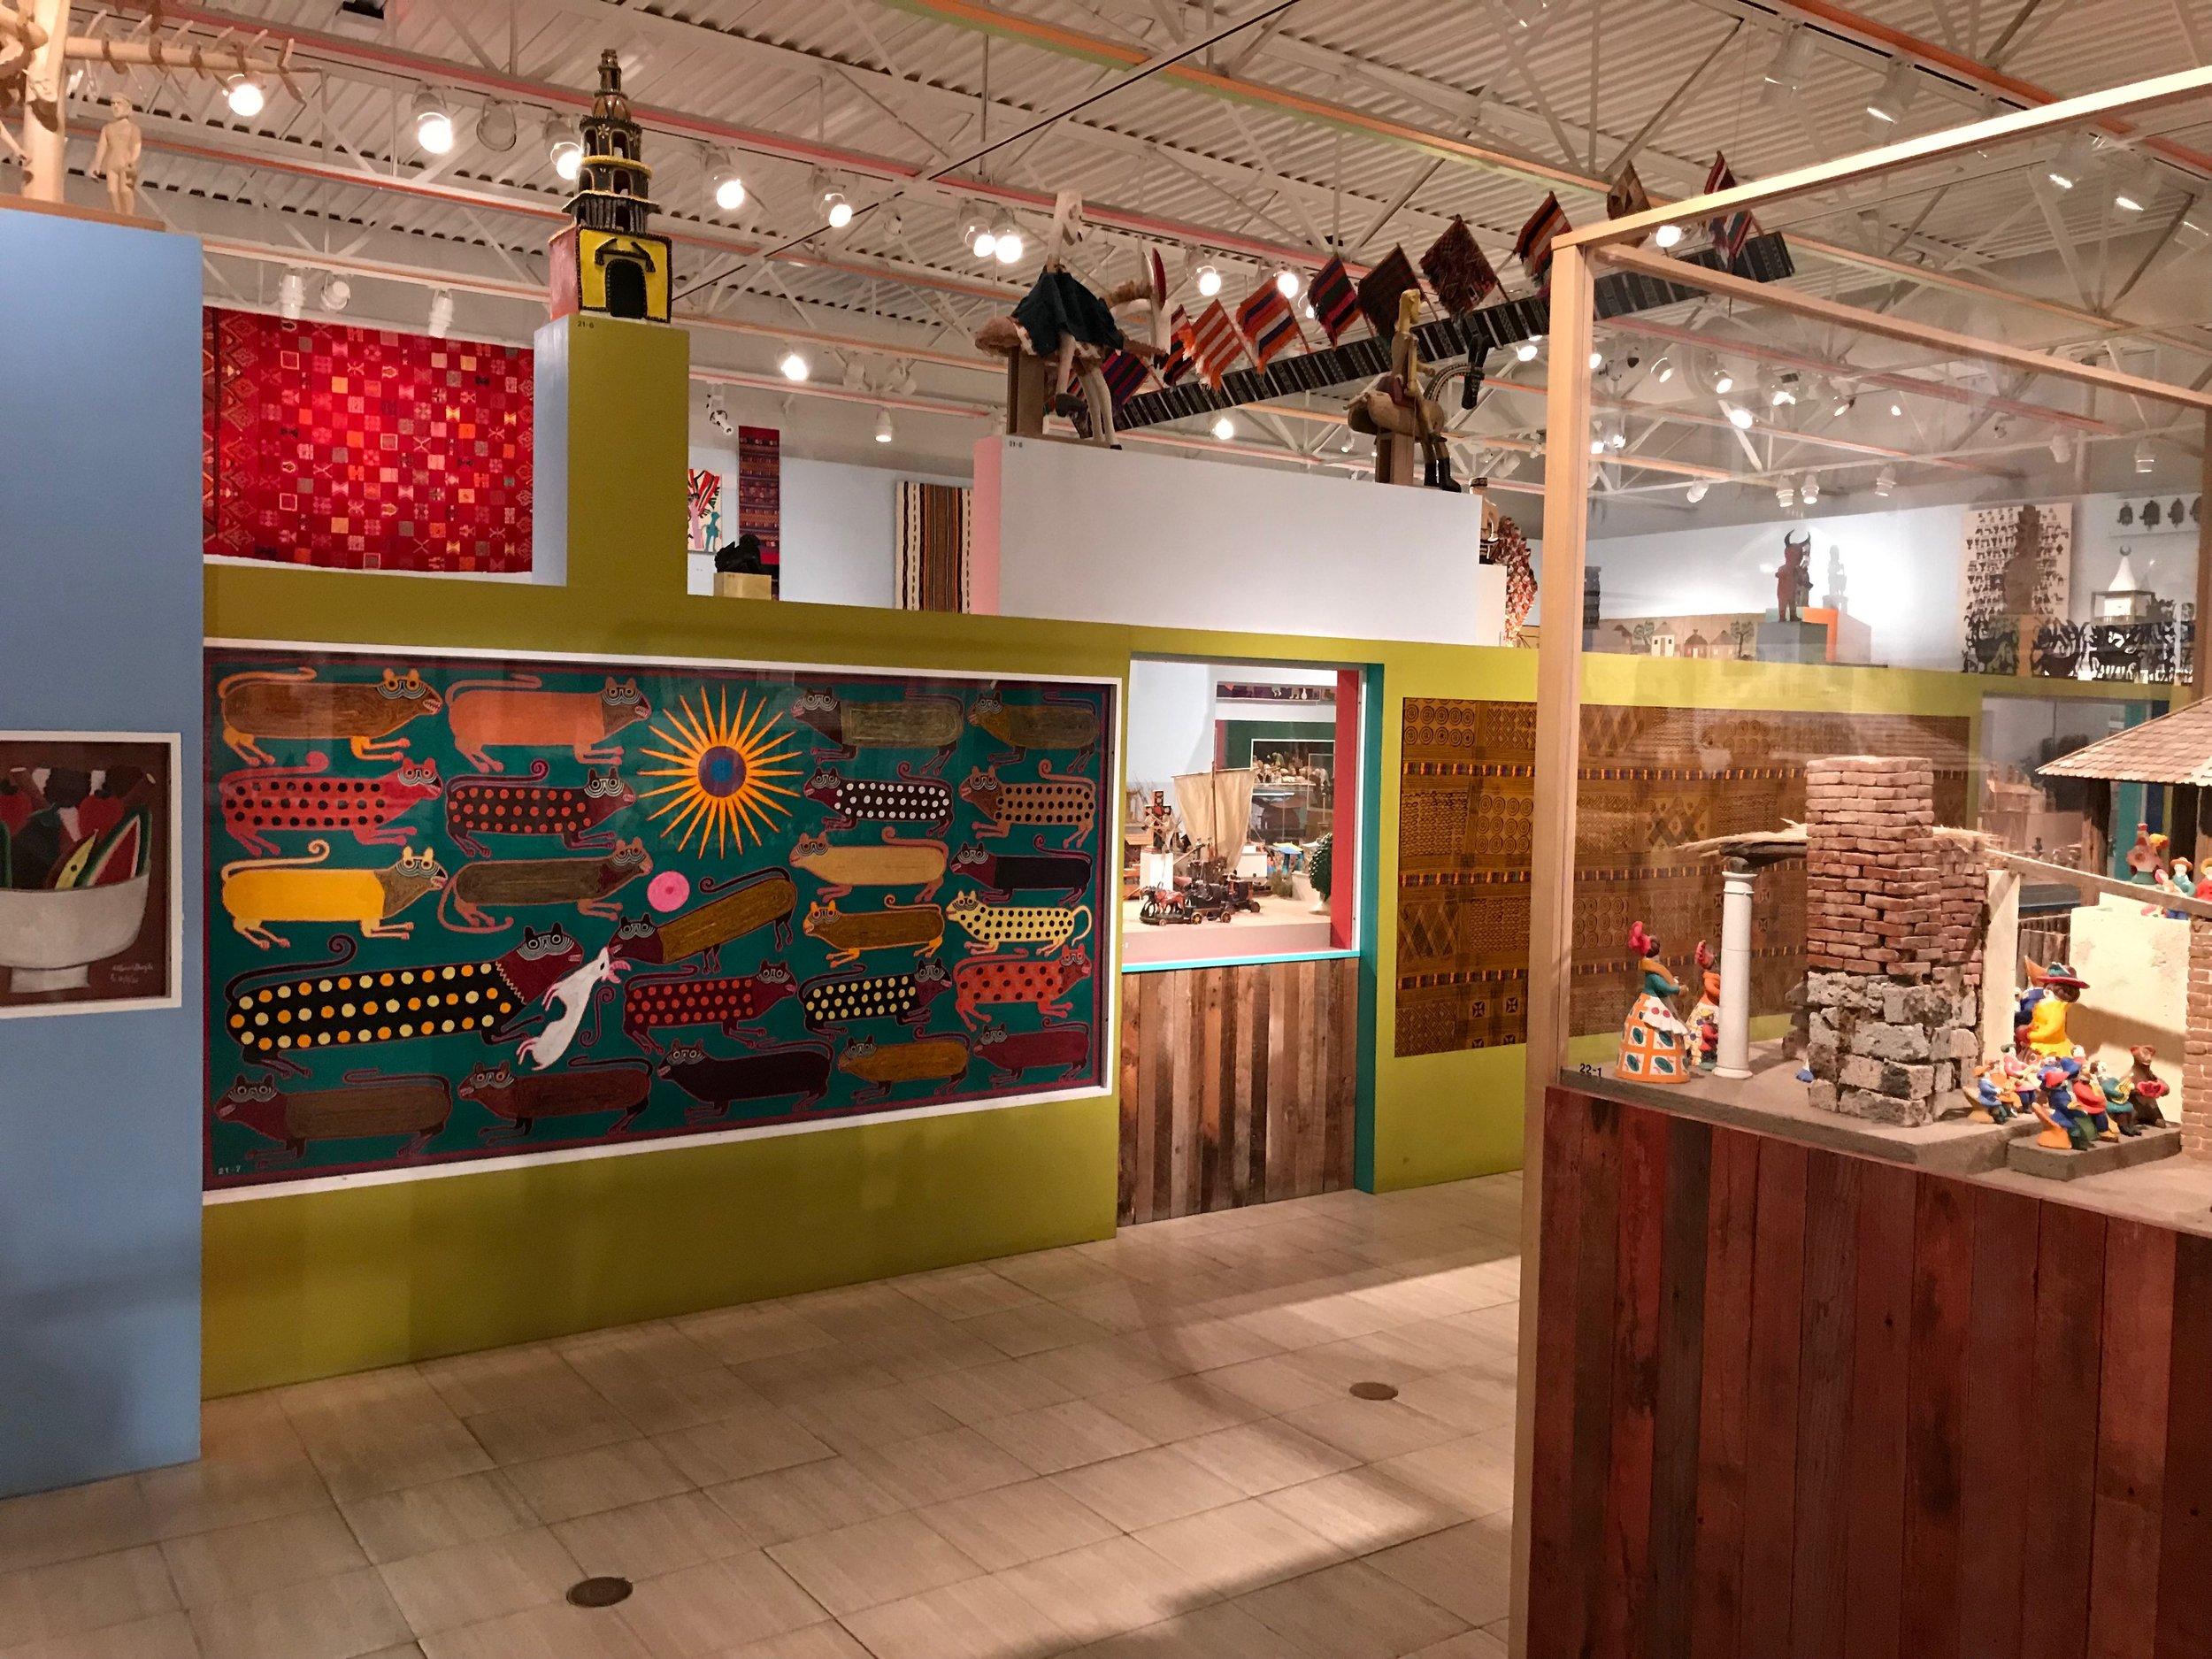 Alexander Girard Wing at The Museum of International Folk Art